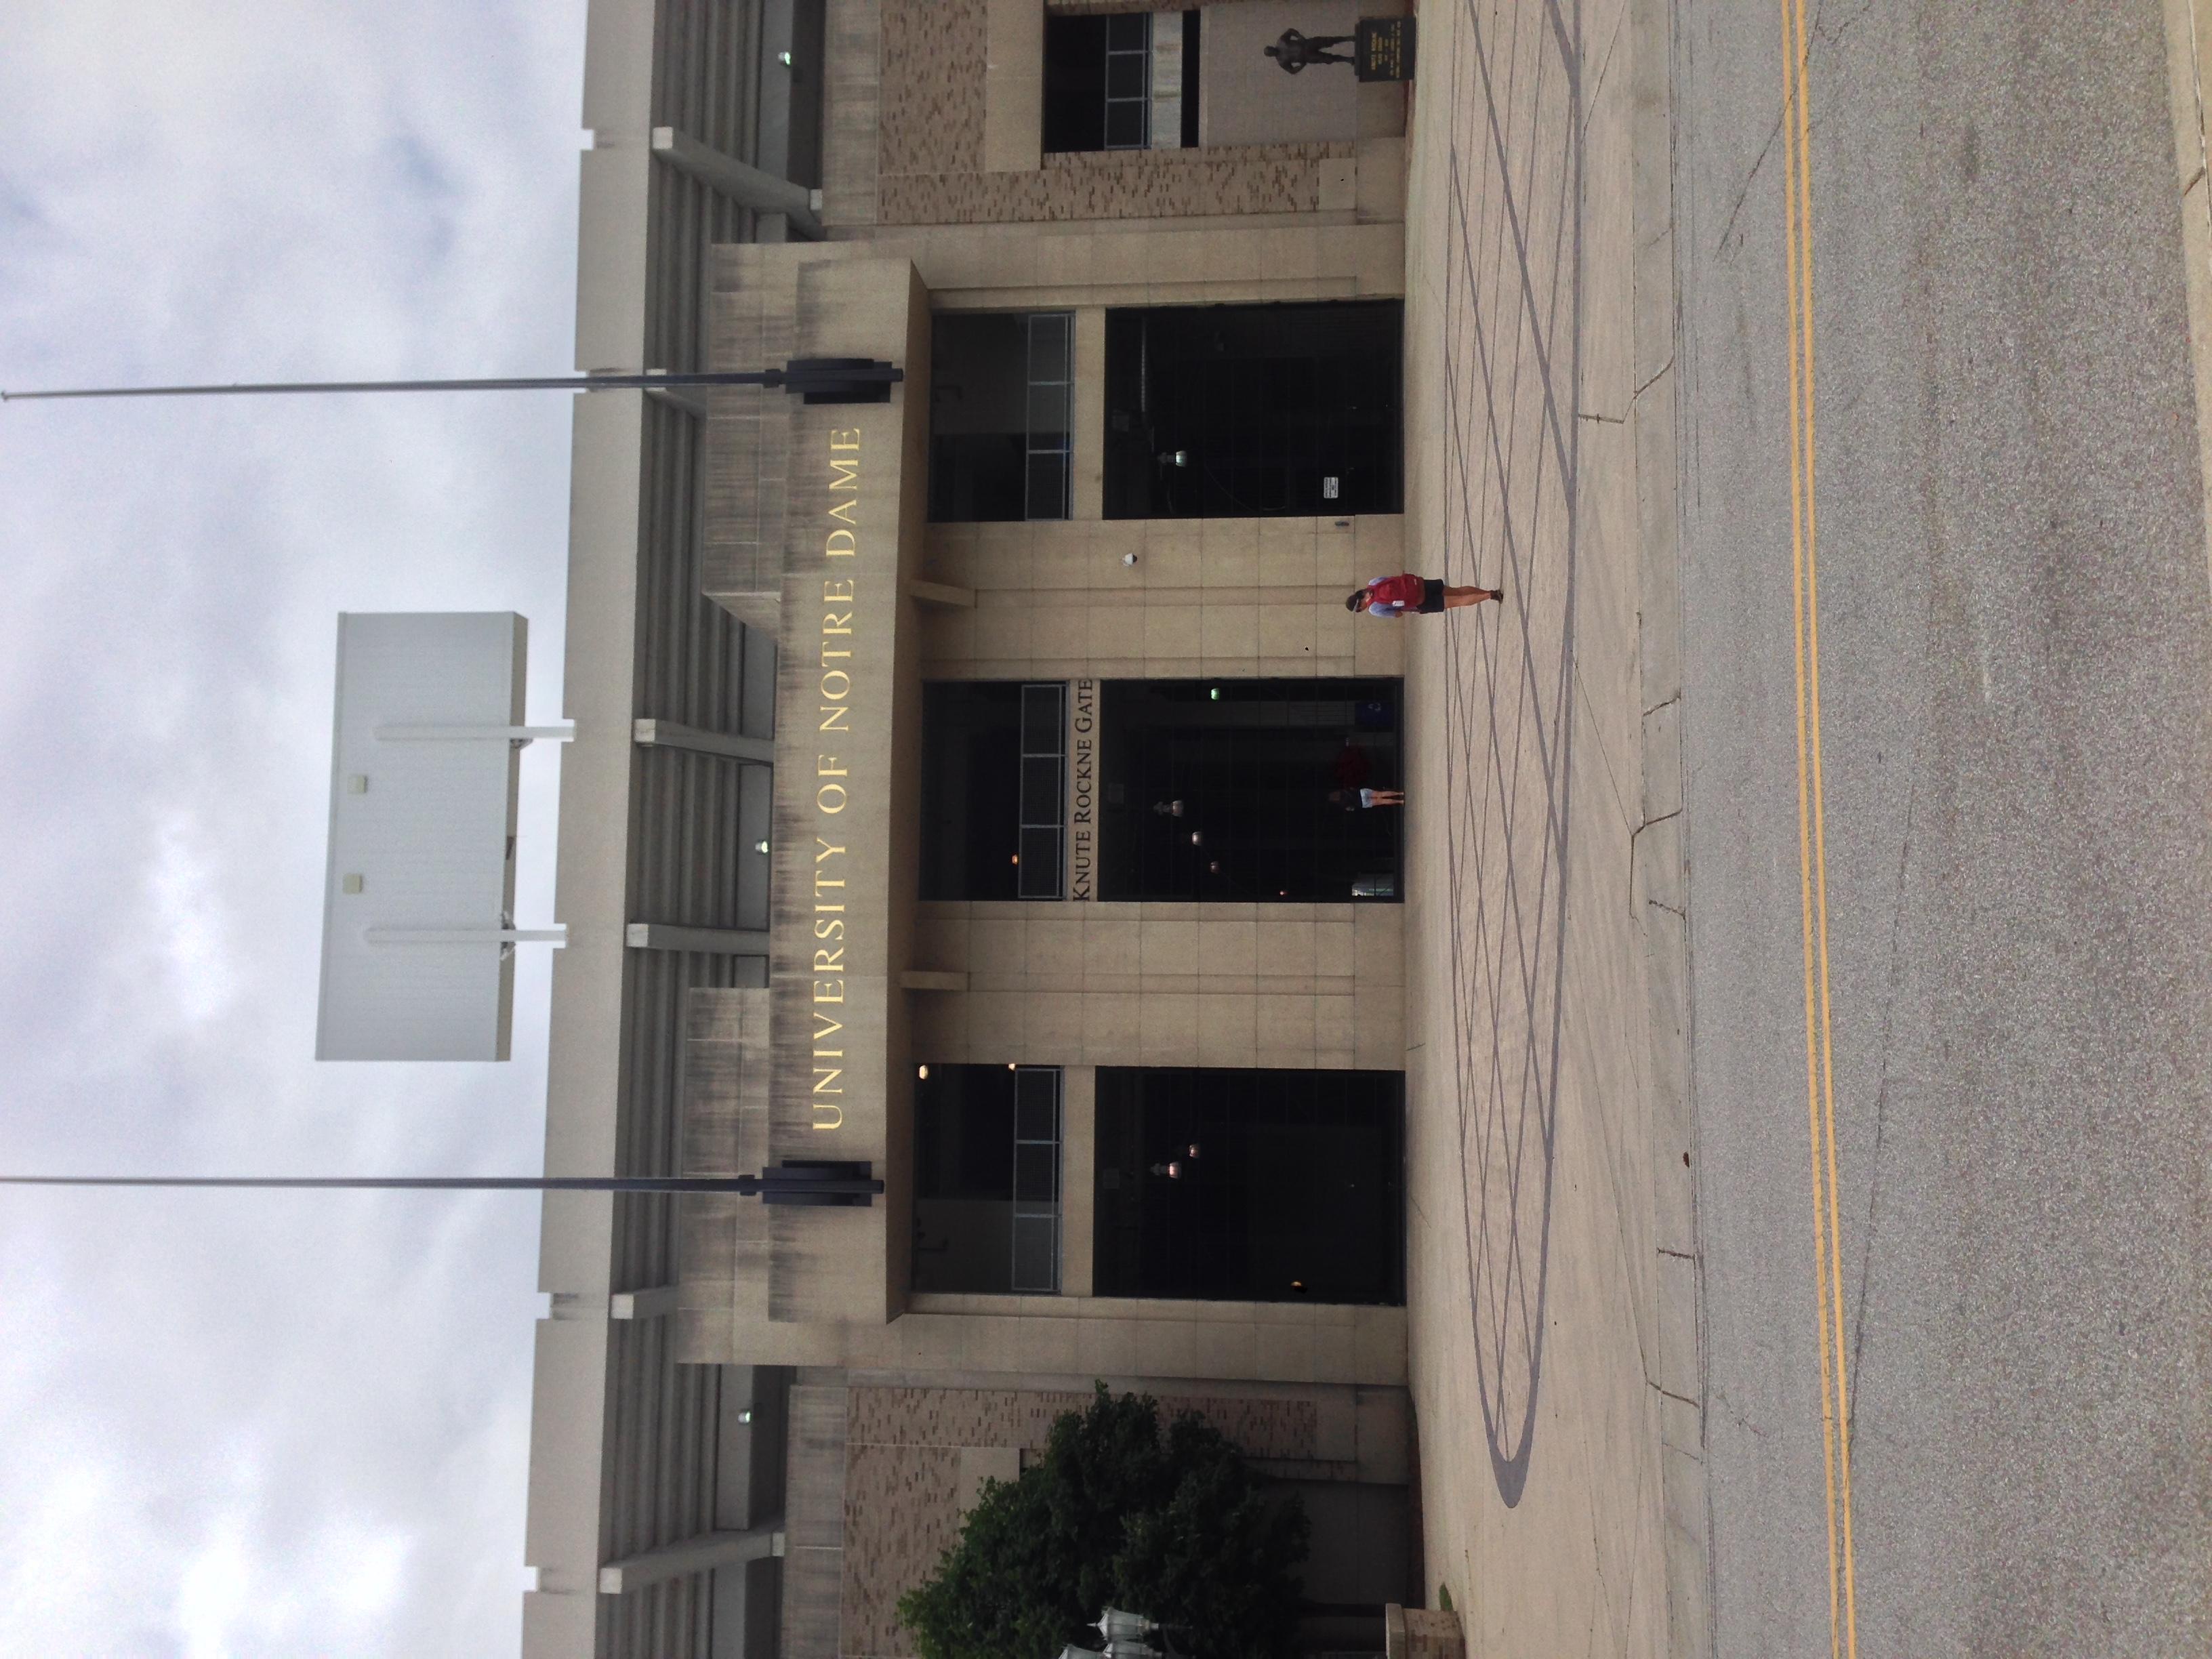 Notre Dame's stadium is on campus